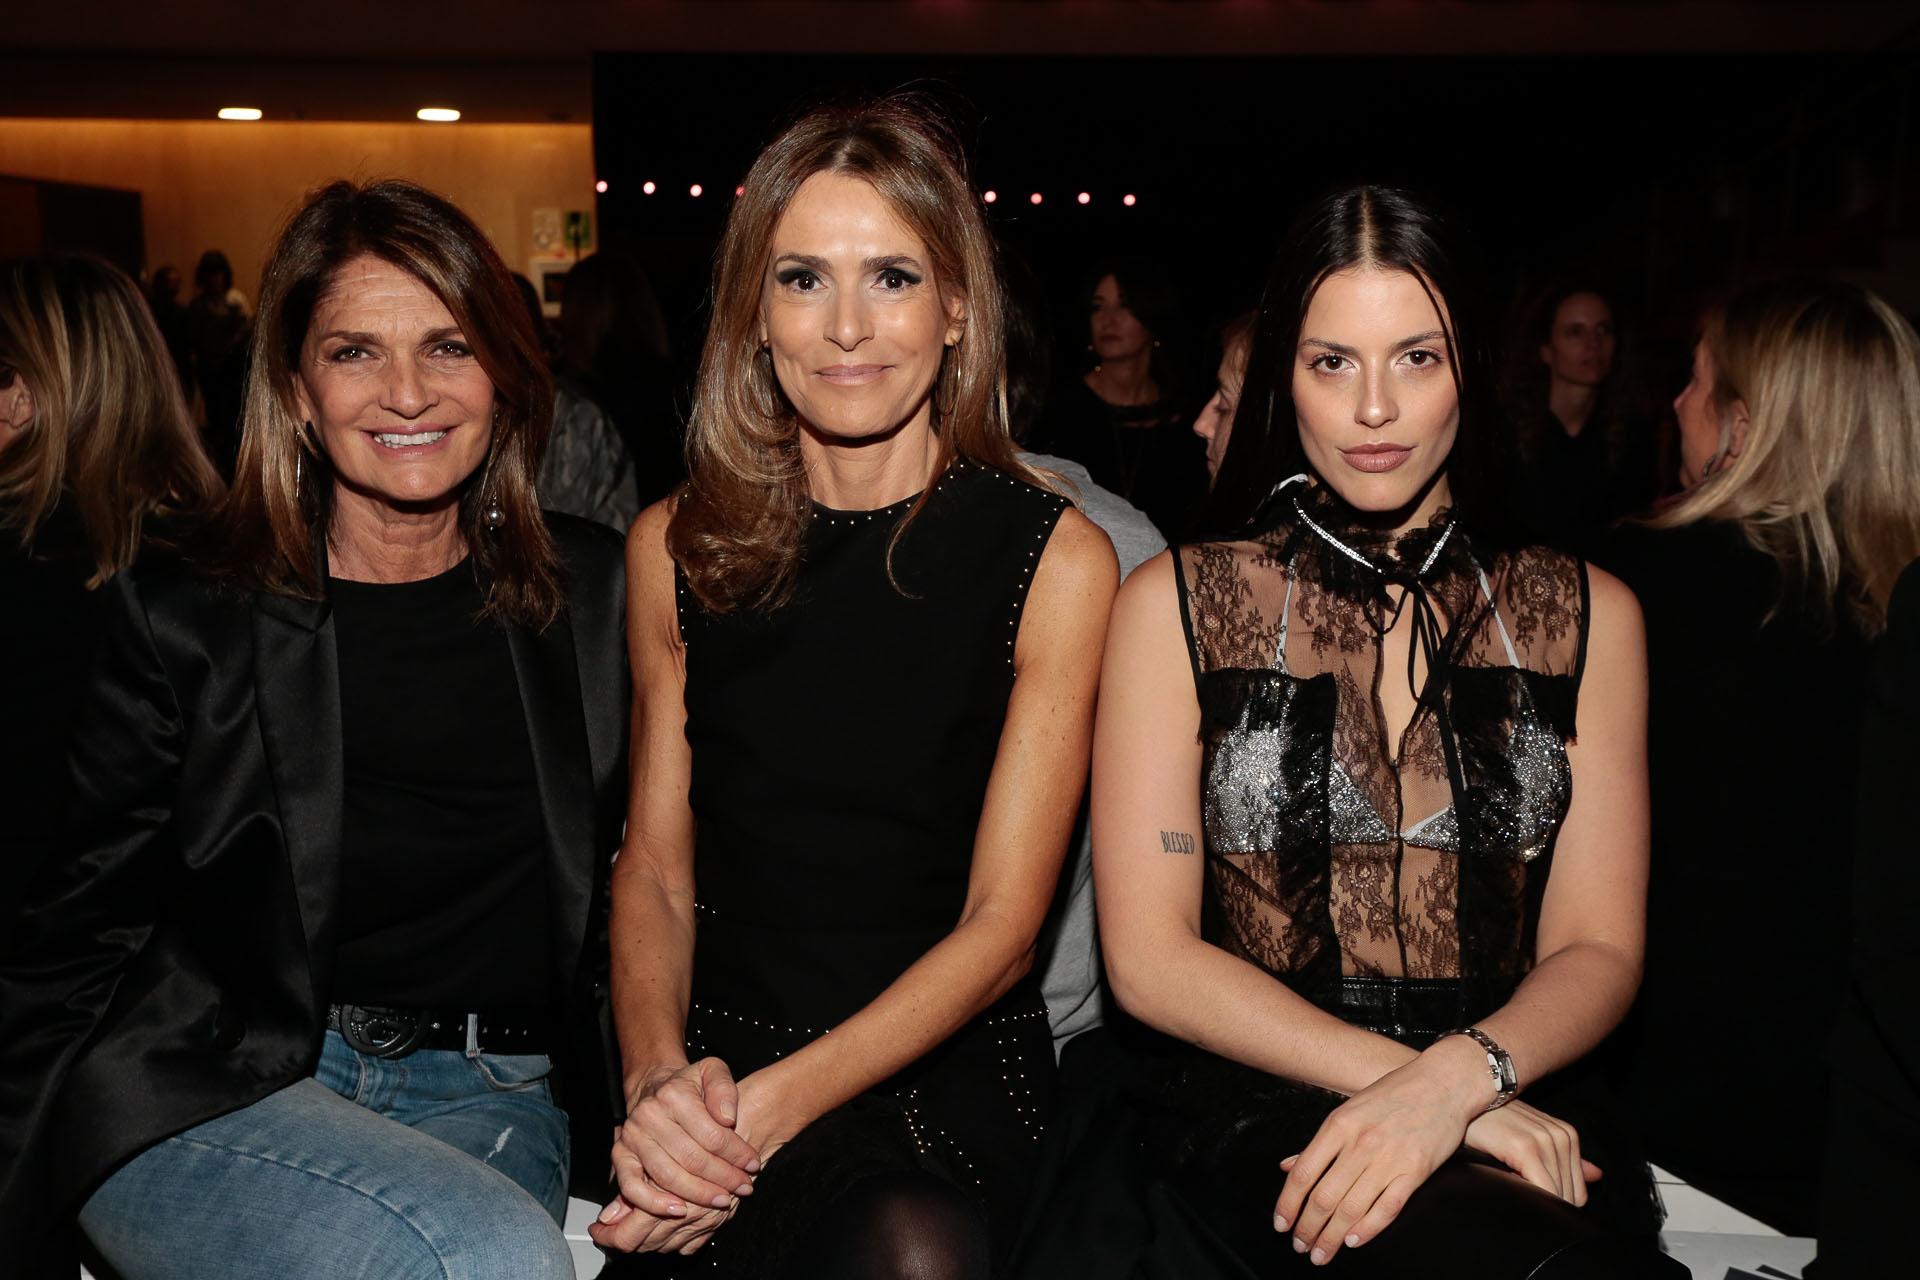 Teresa Calandra, Rossella Della Giovampaola y Agustina Marzari Bobbio